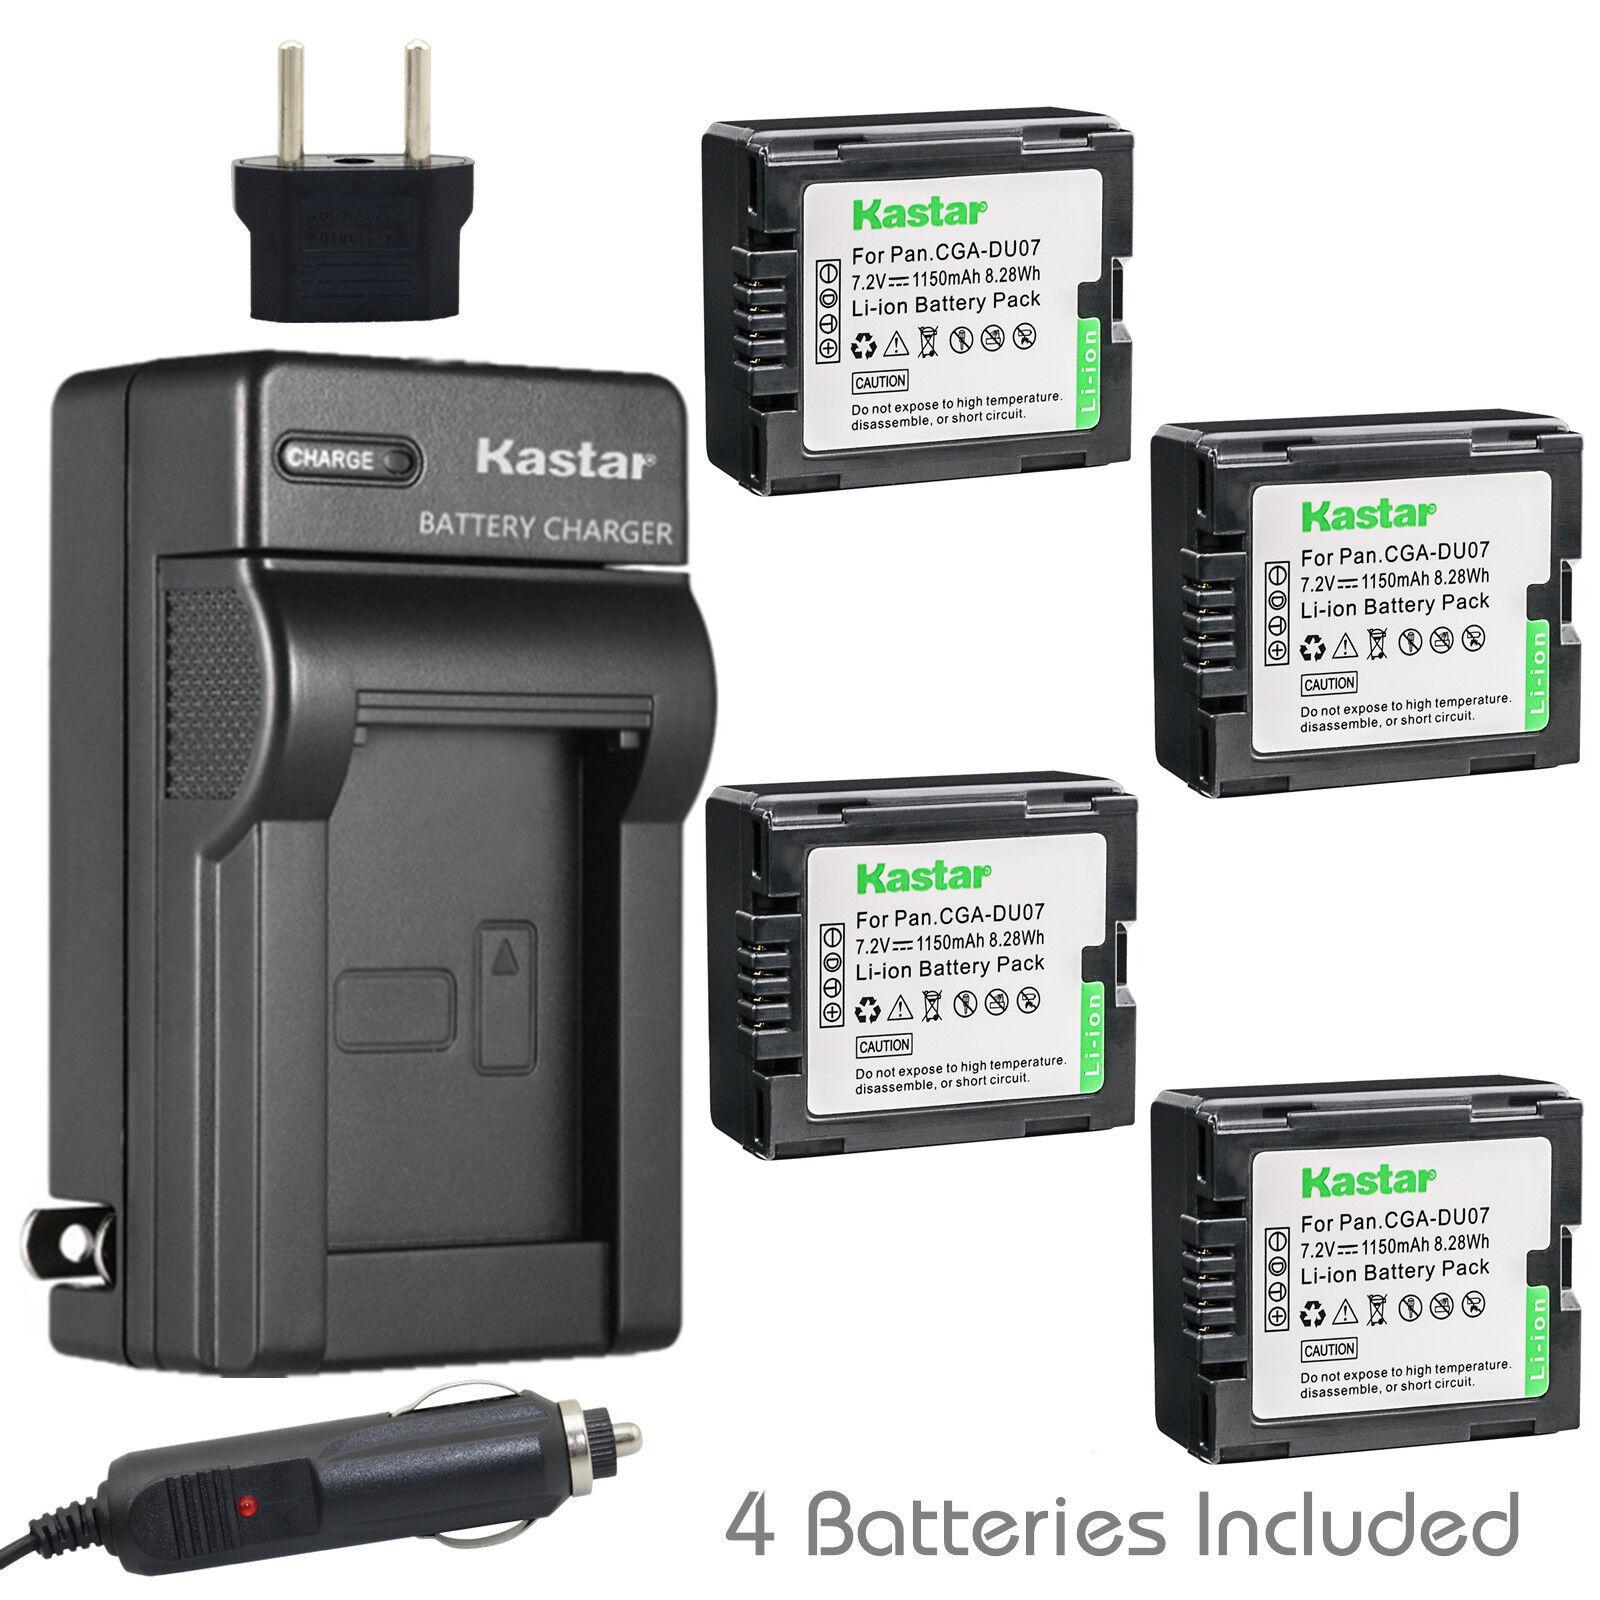 DZ-HS803 LCD USB Battery Charger for Hitachi DZ-HS403 DZ-HS503 DZ-HS903 Camcorder